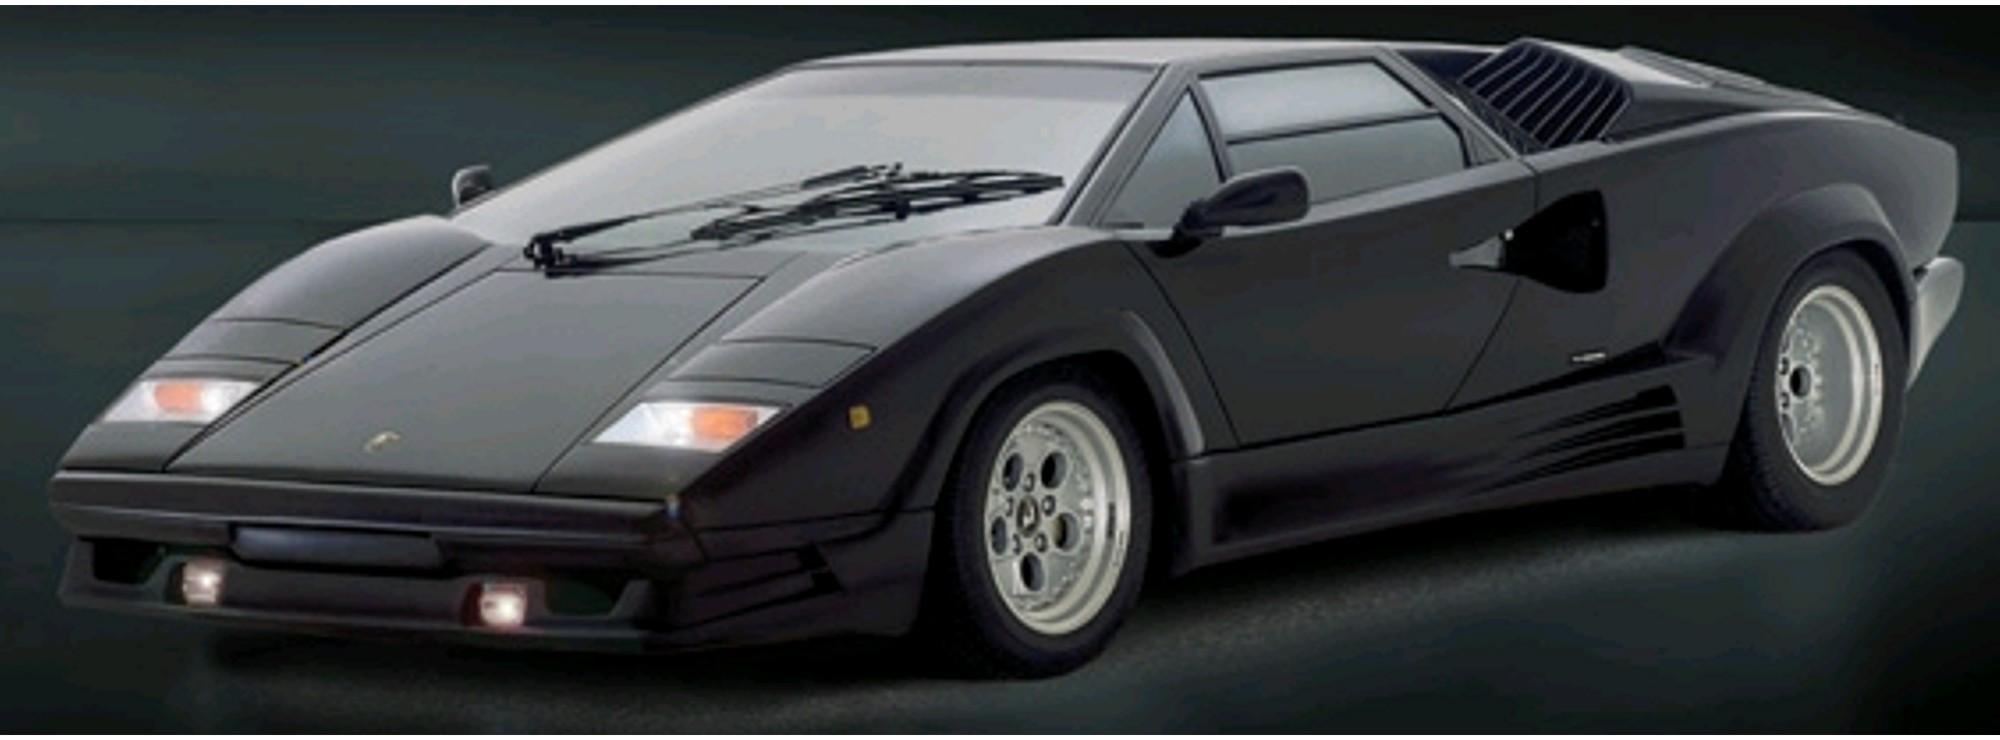 Italeri 3684 Lamborghini Countach 25th Anniversary Auto Bausatz 1